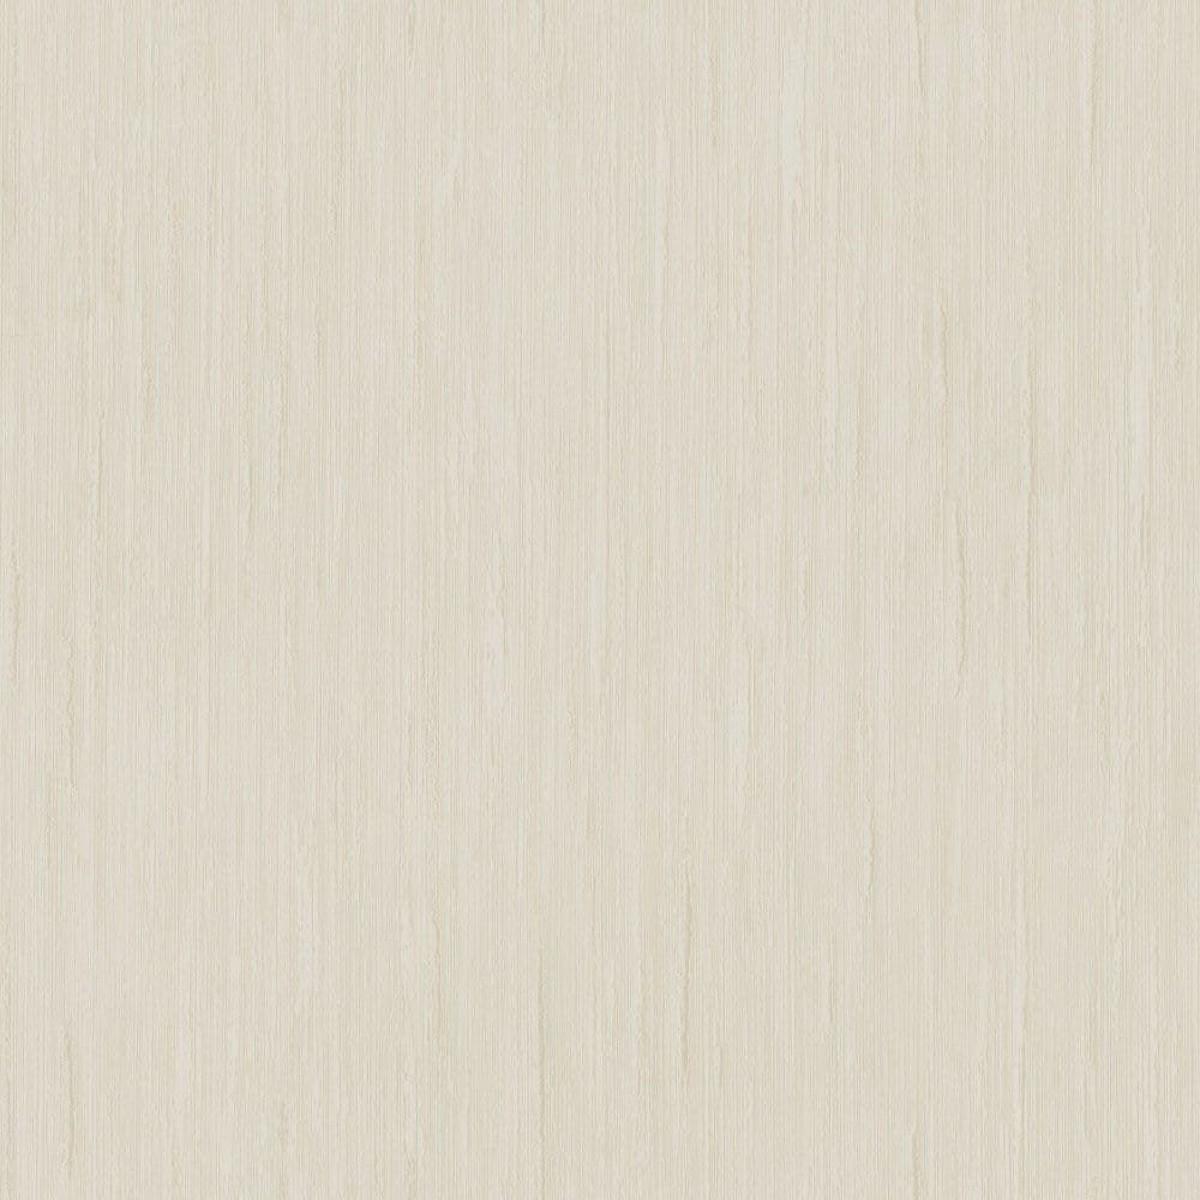 Обои флизелиновые Parato Vintage Home серые 0.53 м 3971